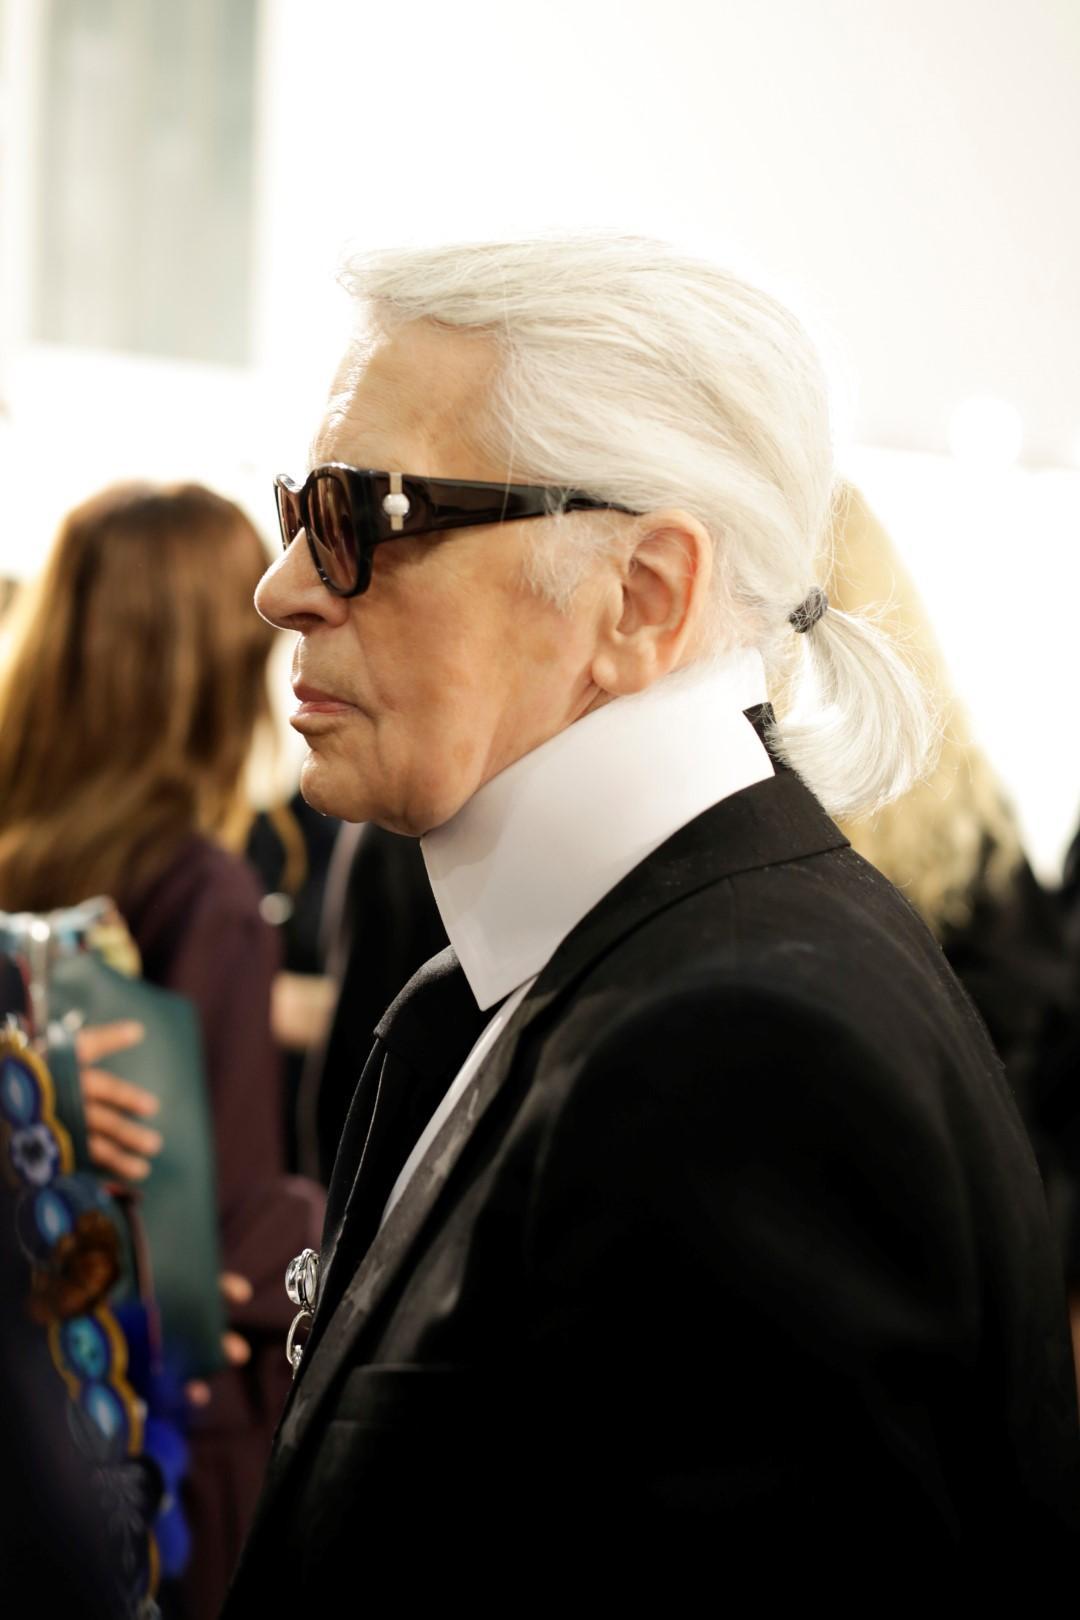 Karl Lagerfeld, l'innovatore: tutte le ragioni per cui mancherà